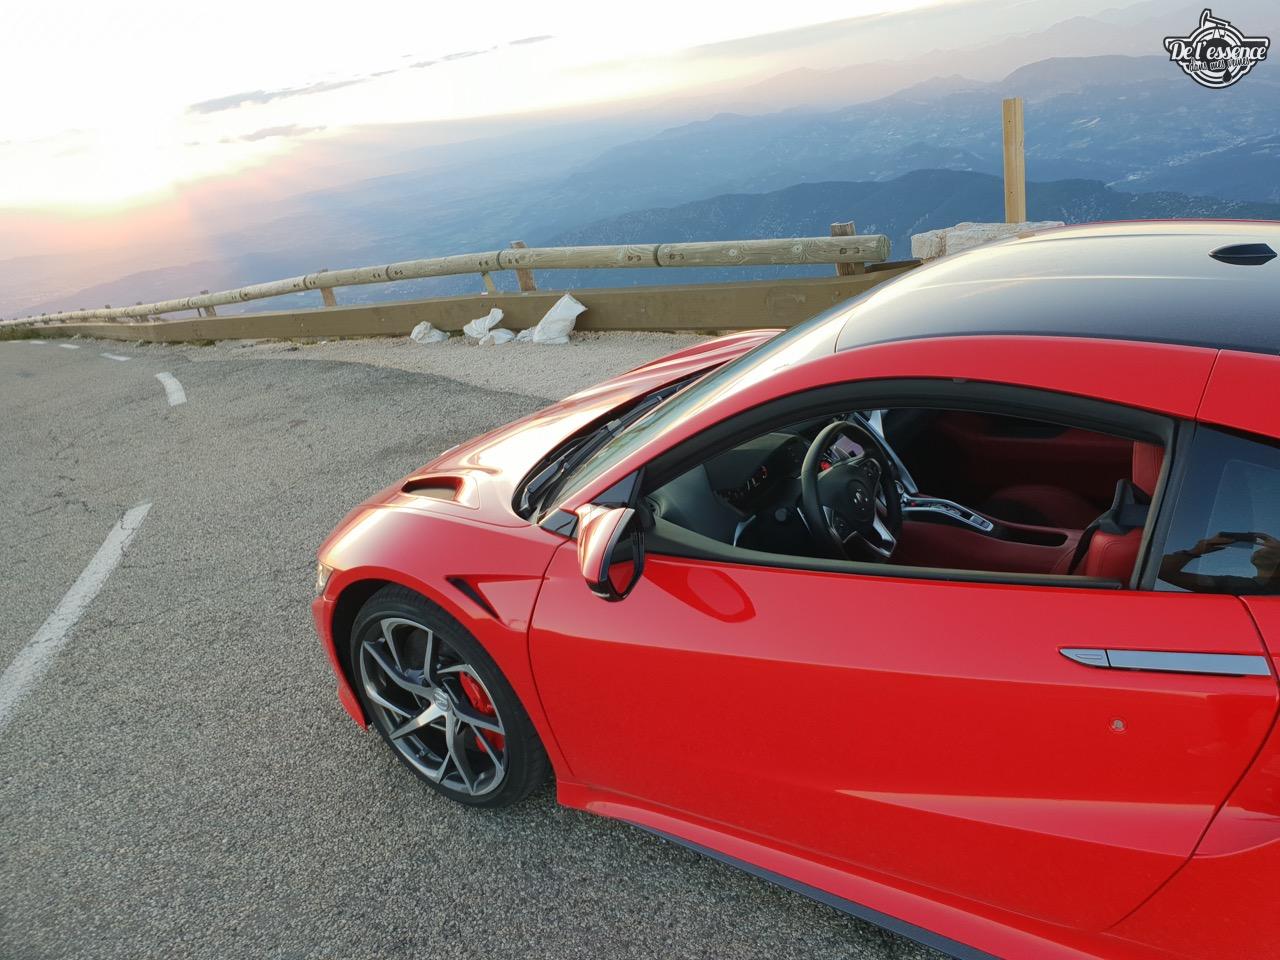 Honda NSX 2017 - Je me souviens... 71